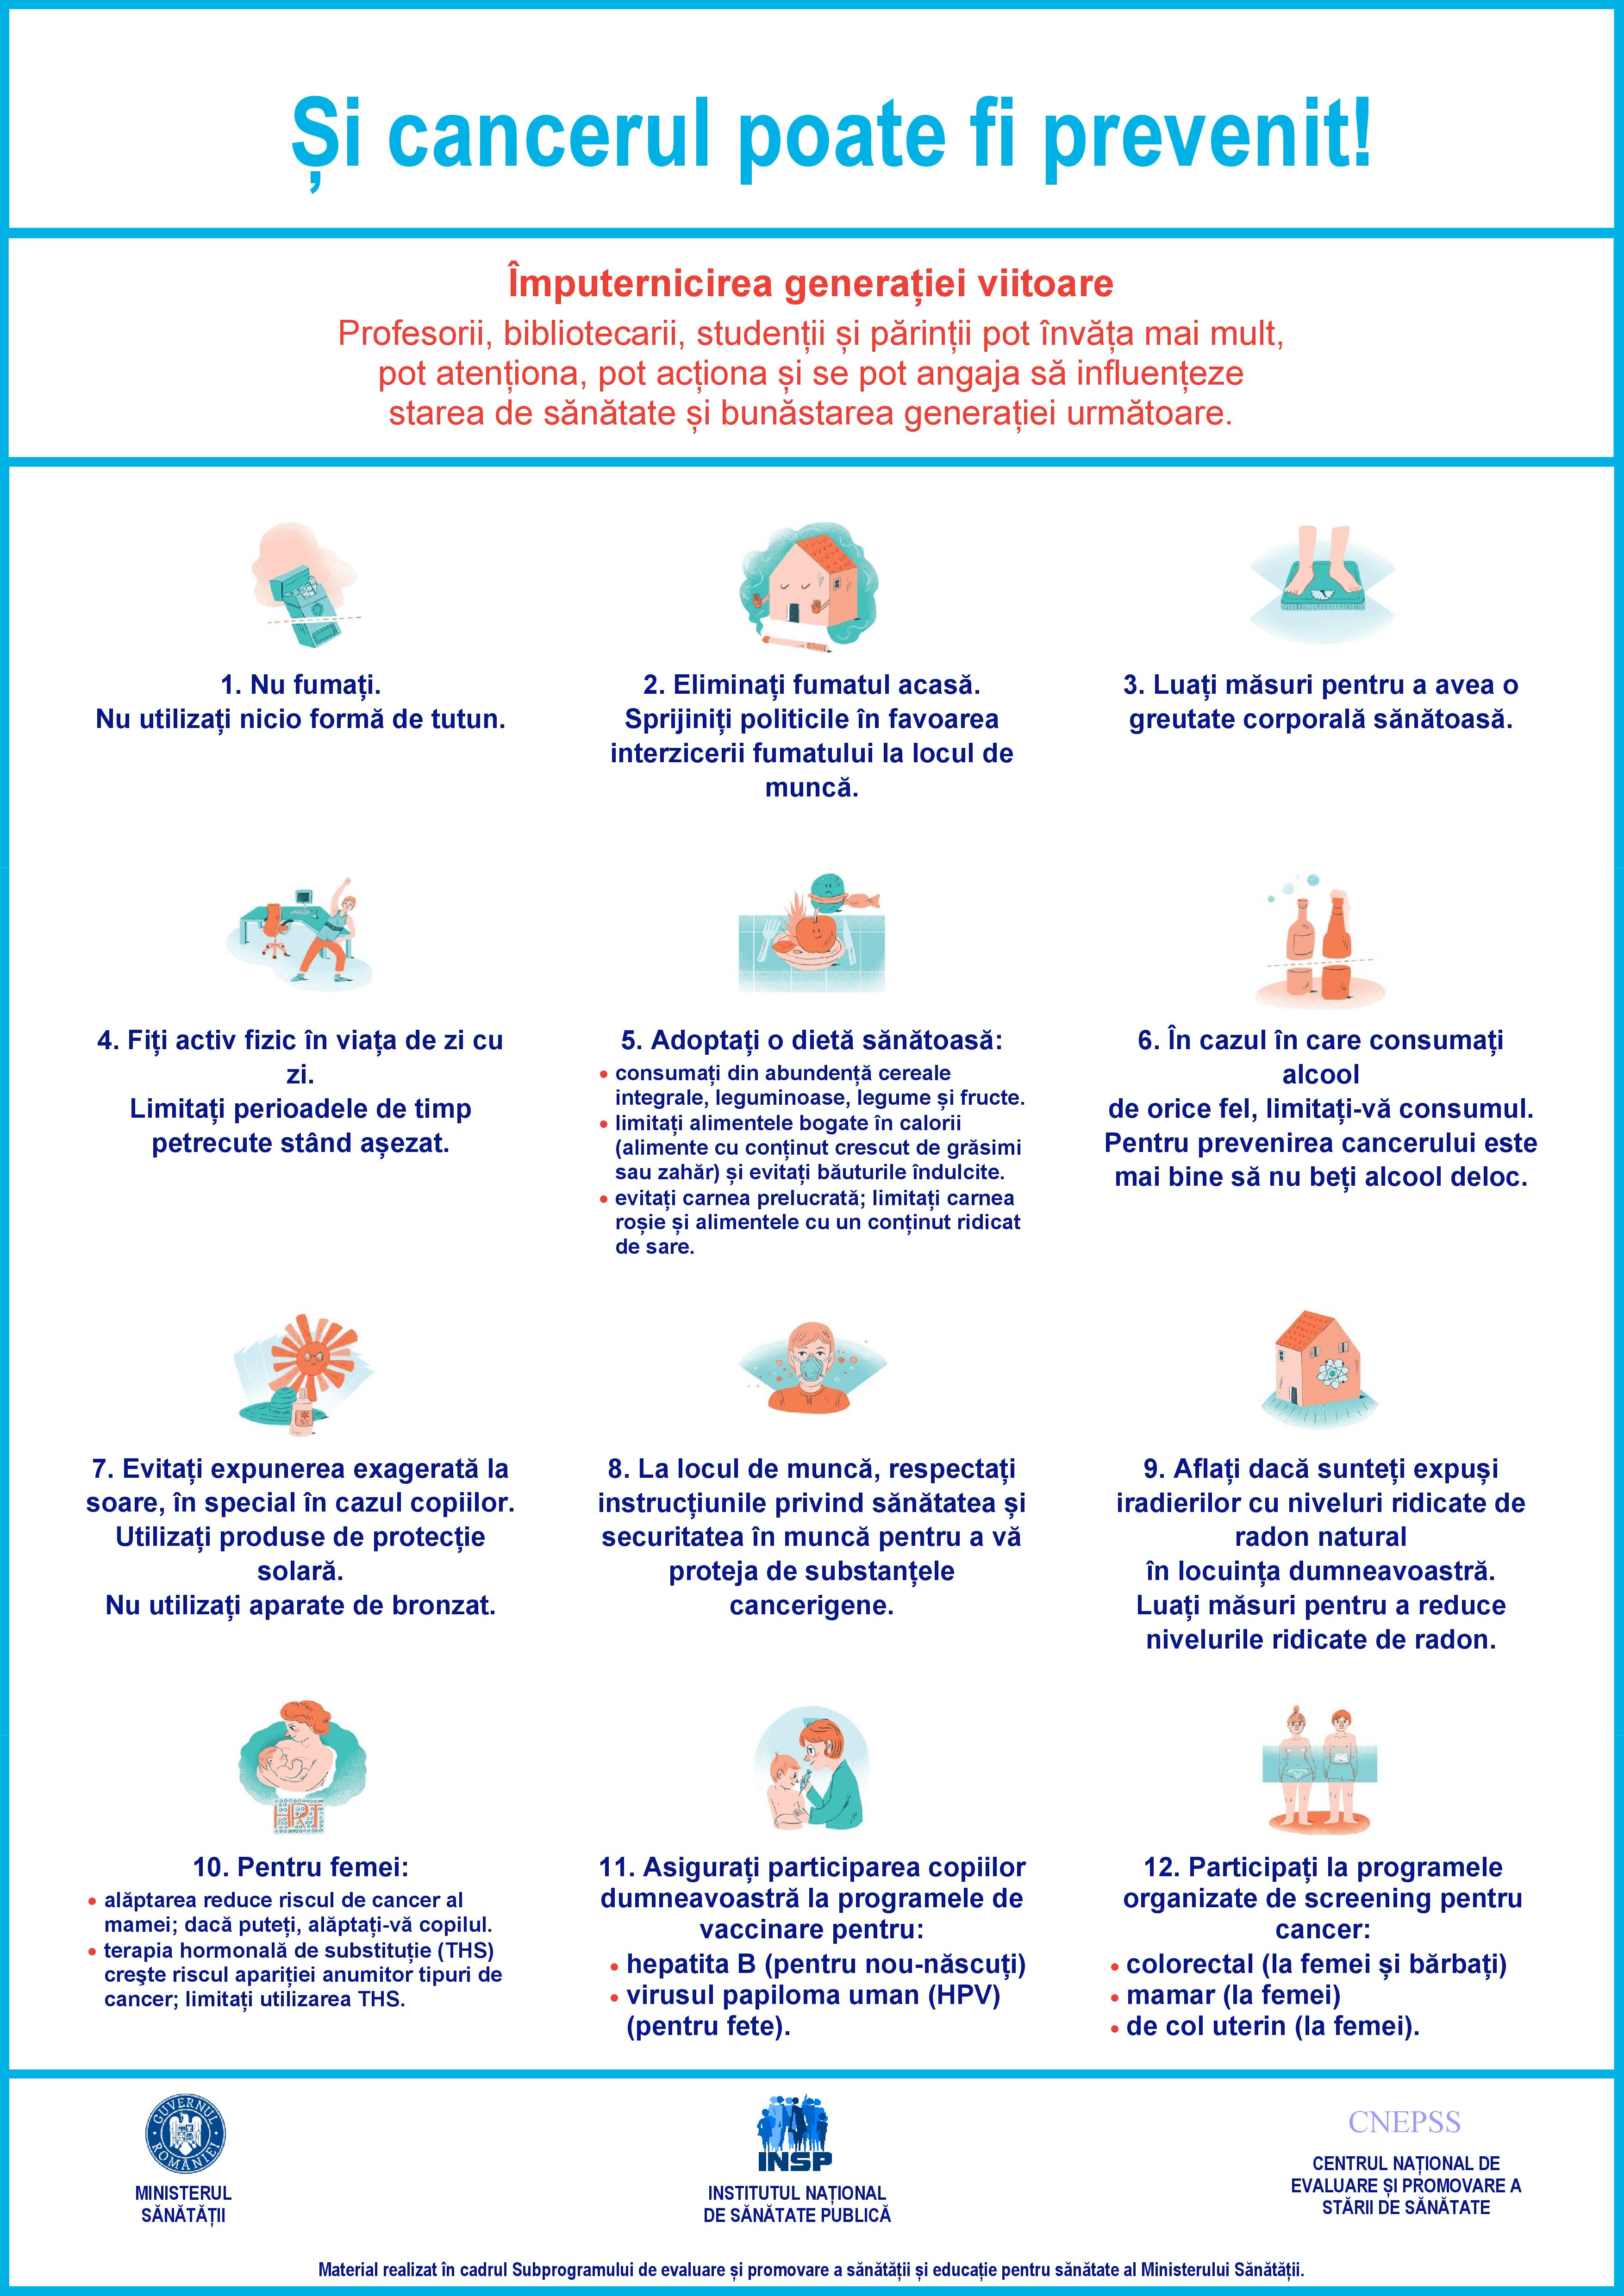 http://www.medstar2000.ro/wp-content/uploads/2019/07/preventia-cancerului.png